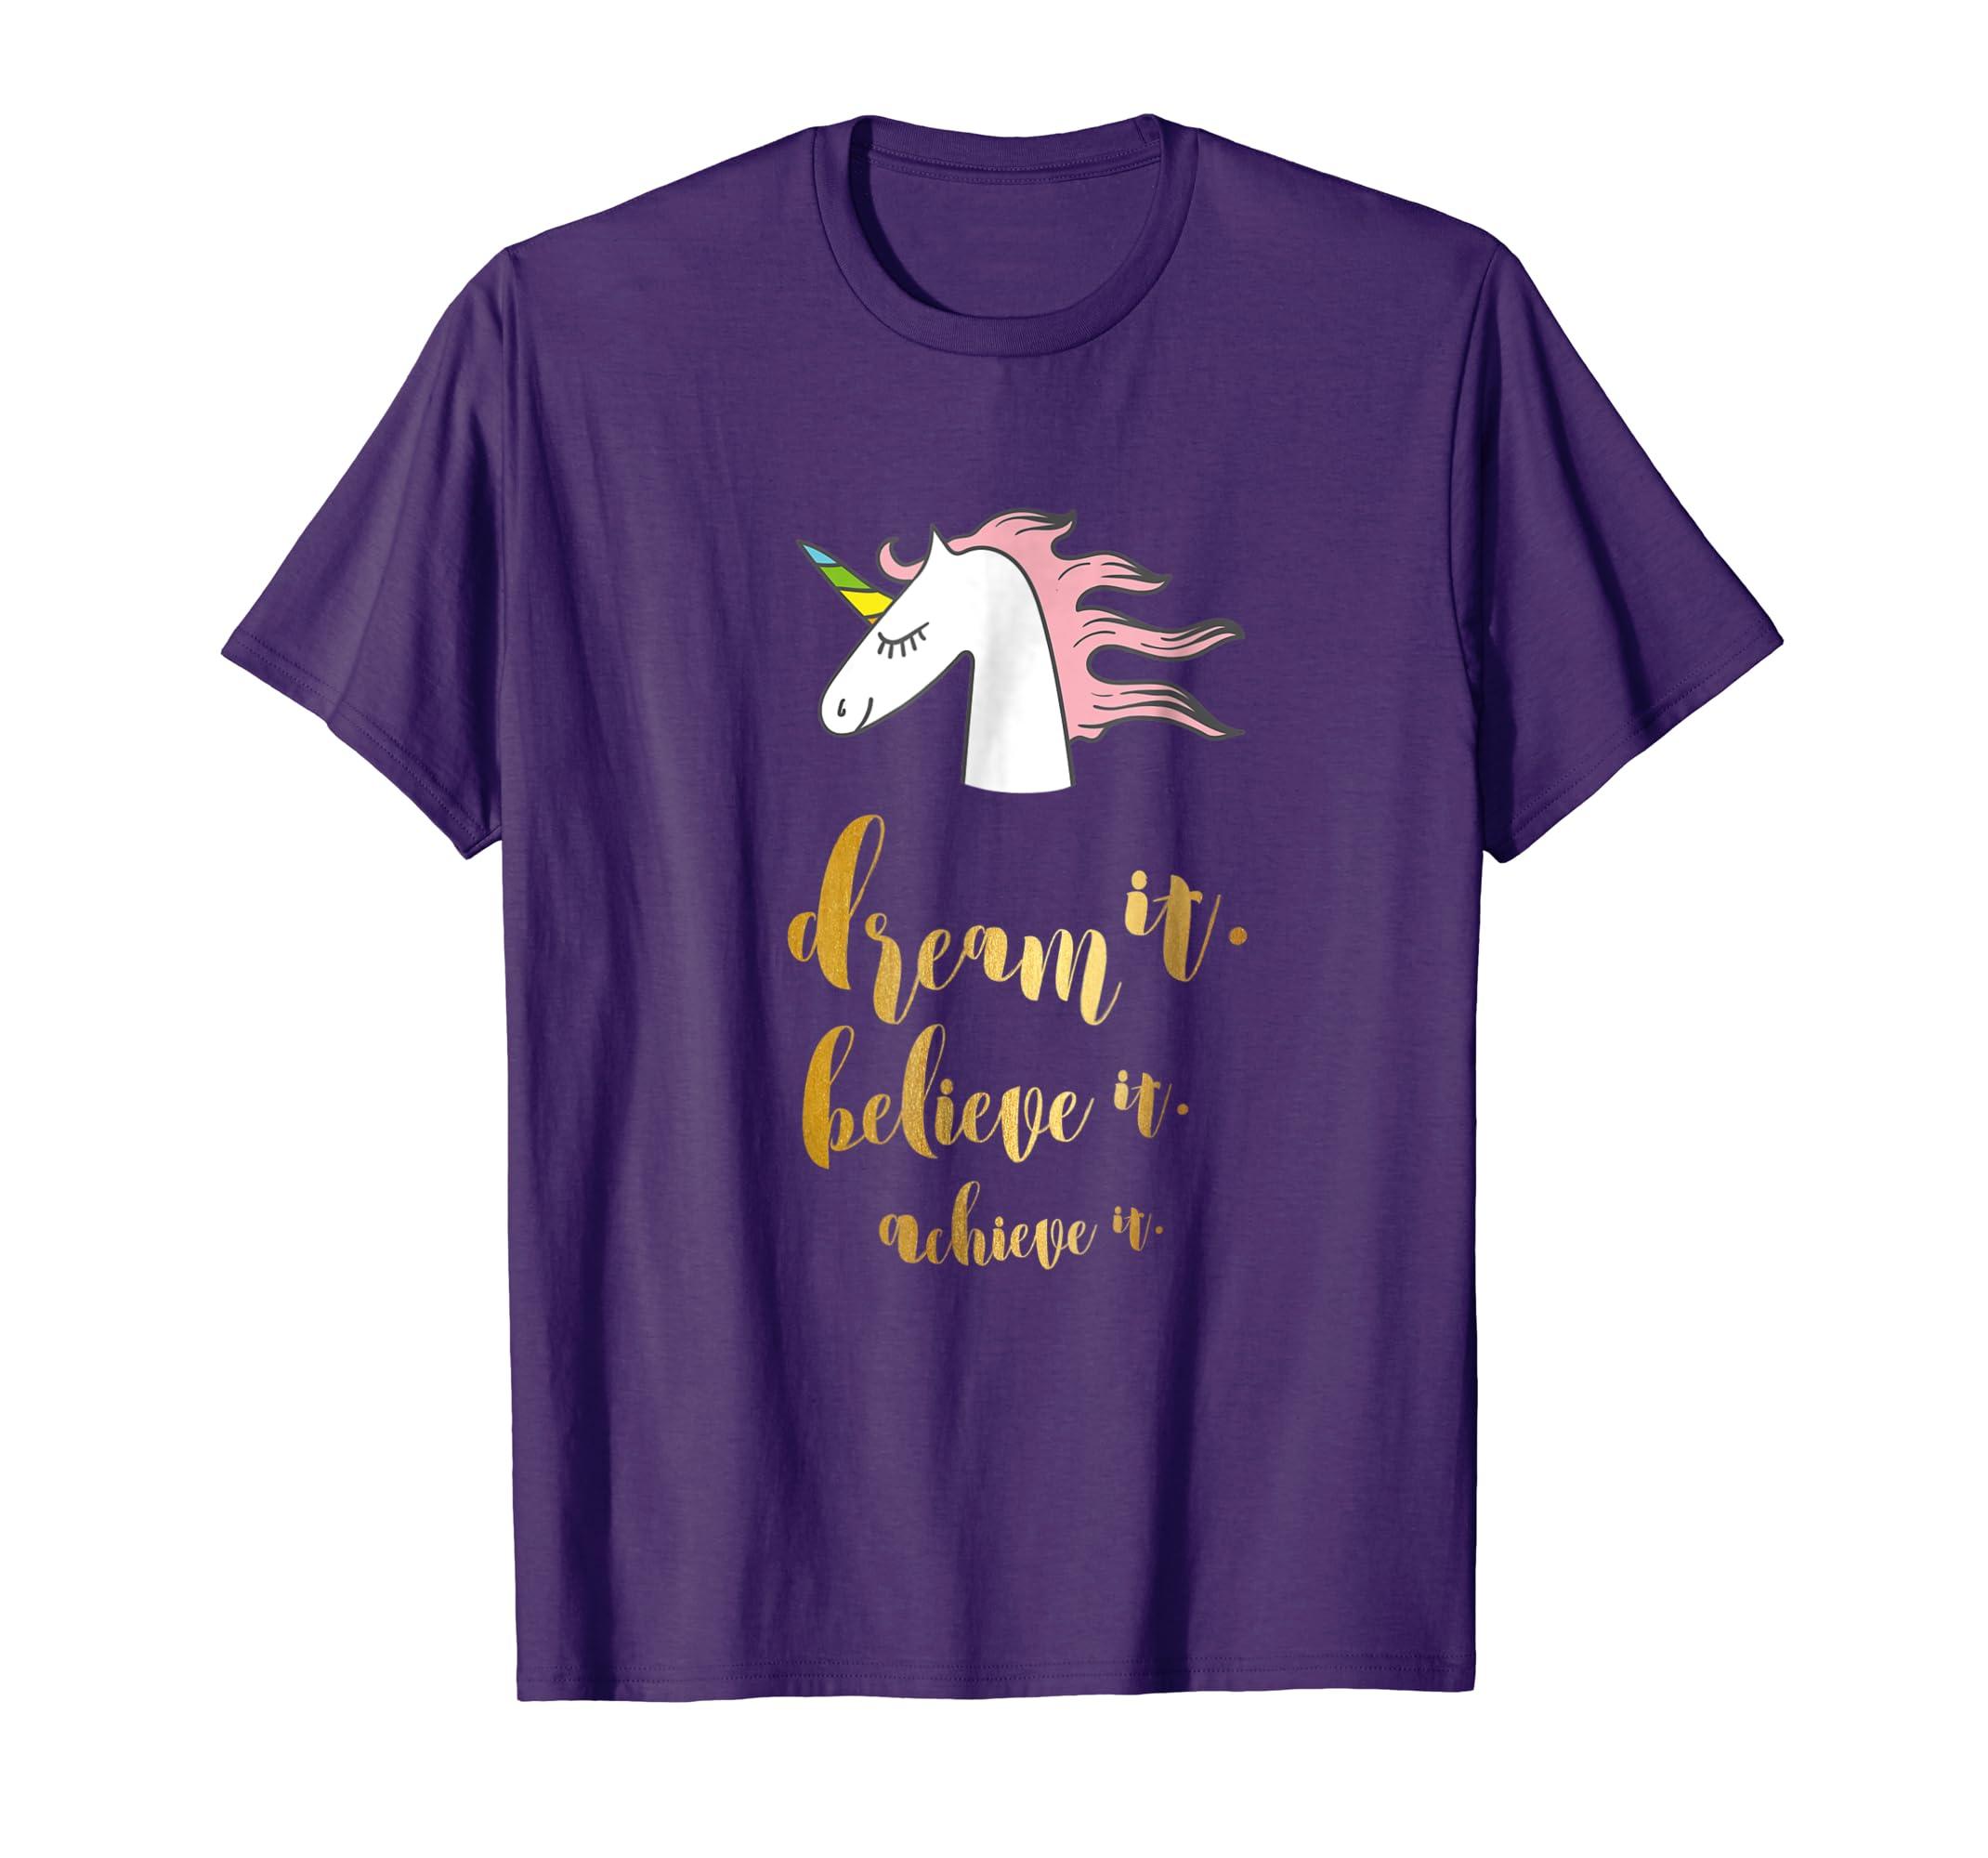 bcac4207f814 Amazon.com  Dream it Believe it Achieve it Shirt Dream Believe Achieve   Clothing